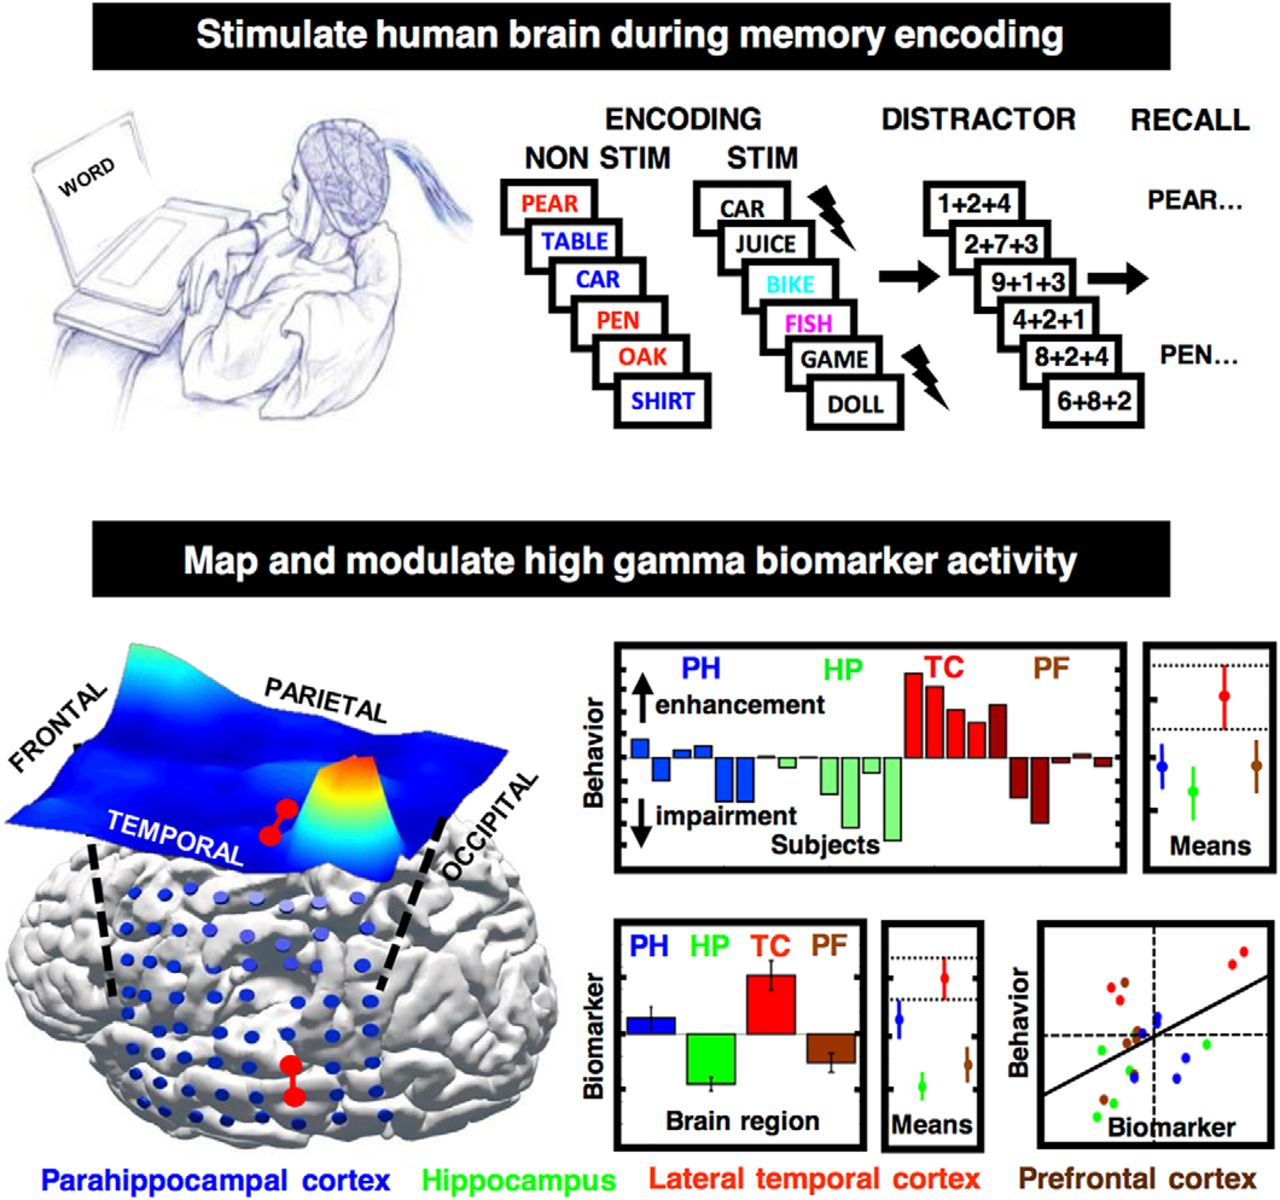 Electrical Stimulation Modulates High γ Activity and Human